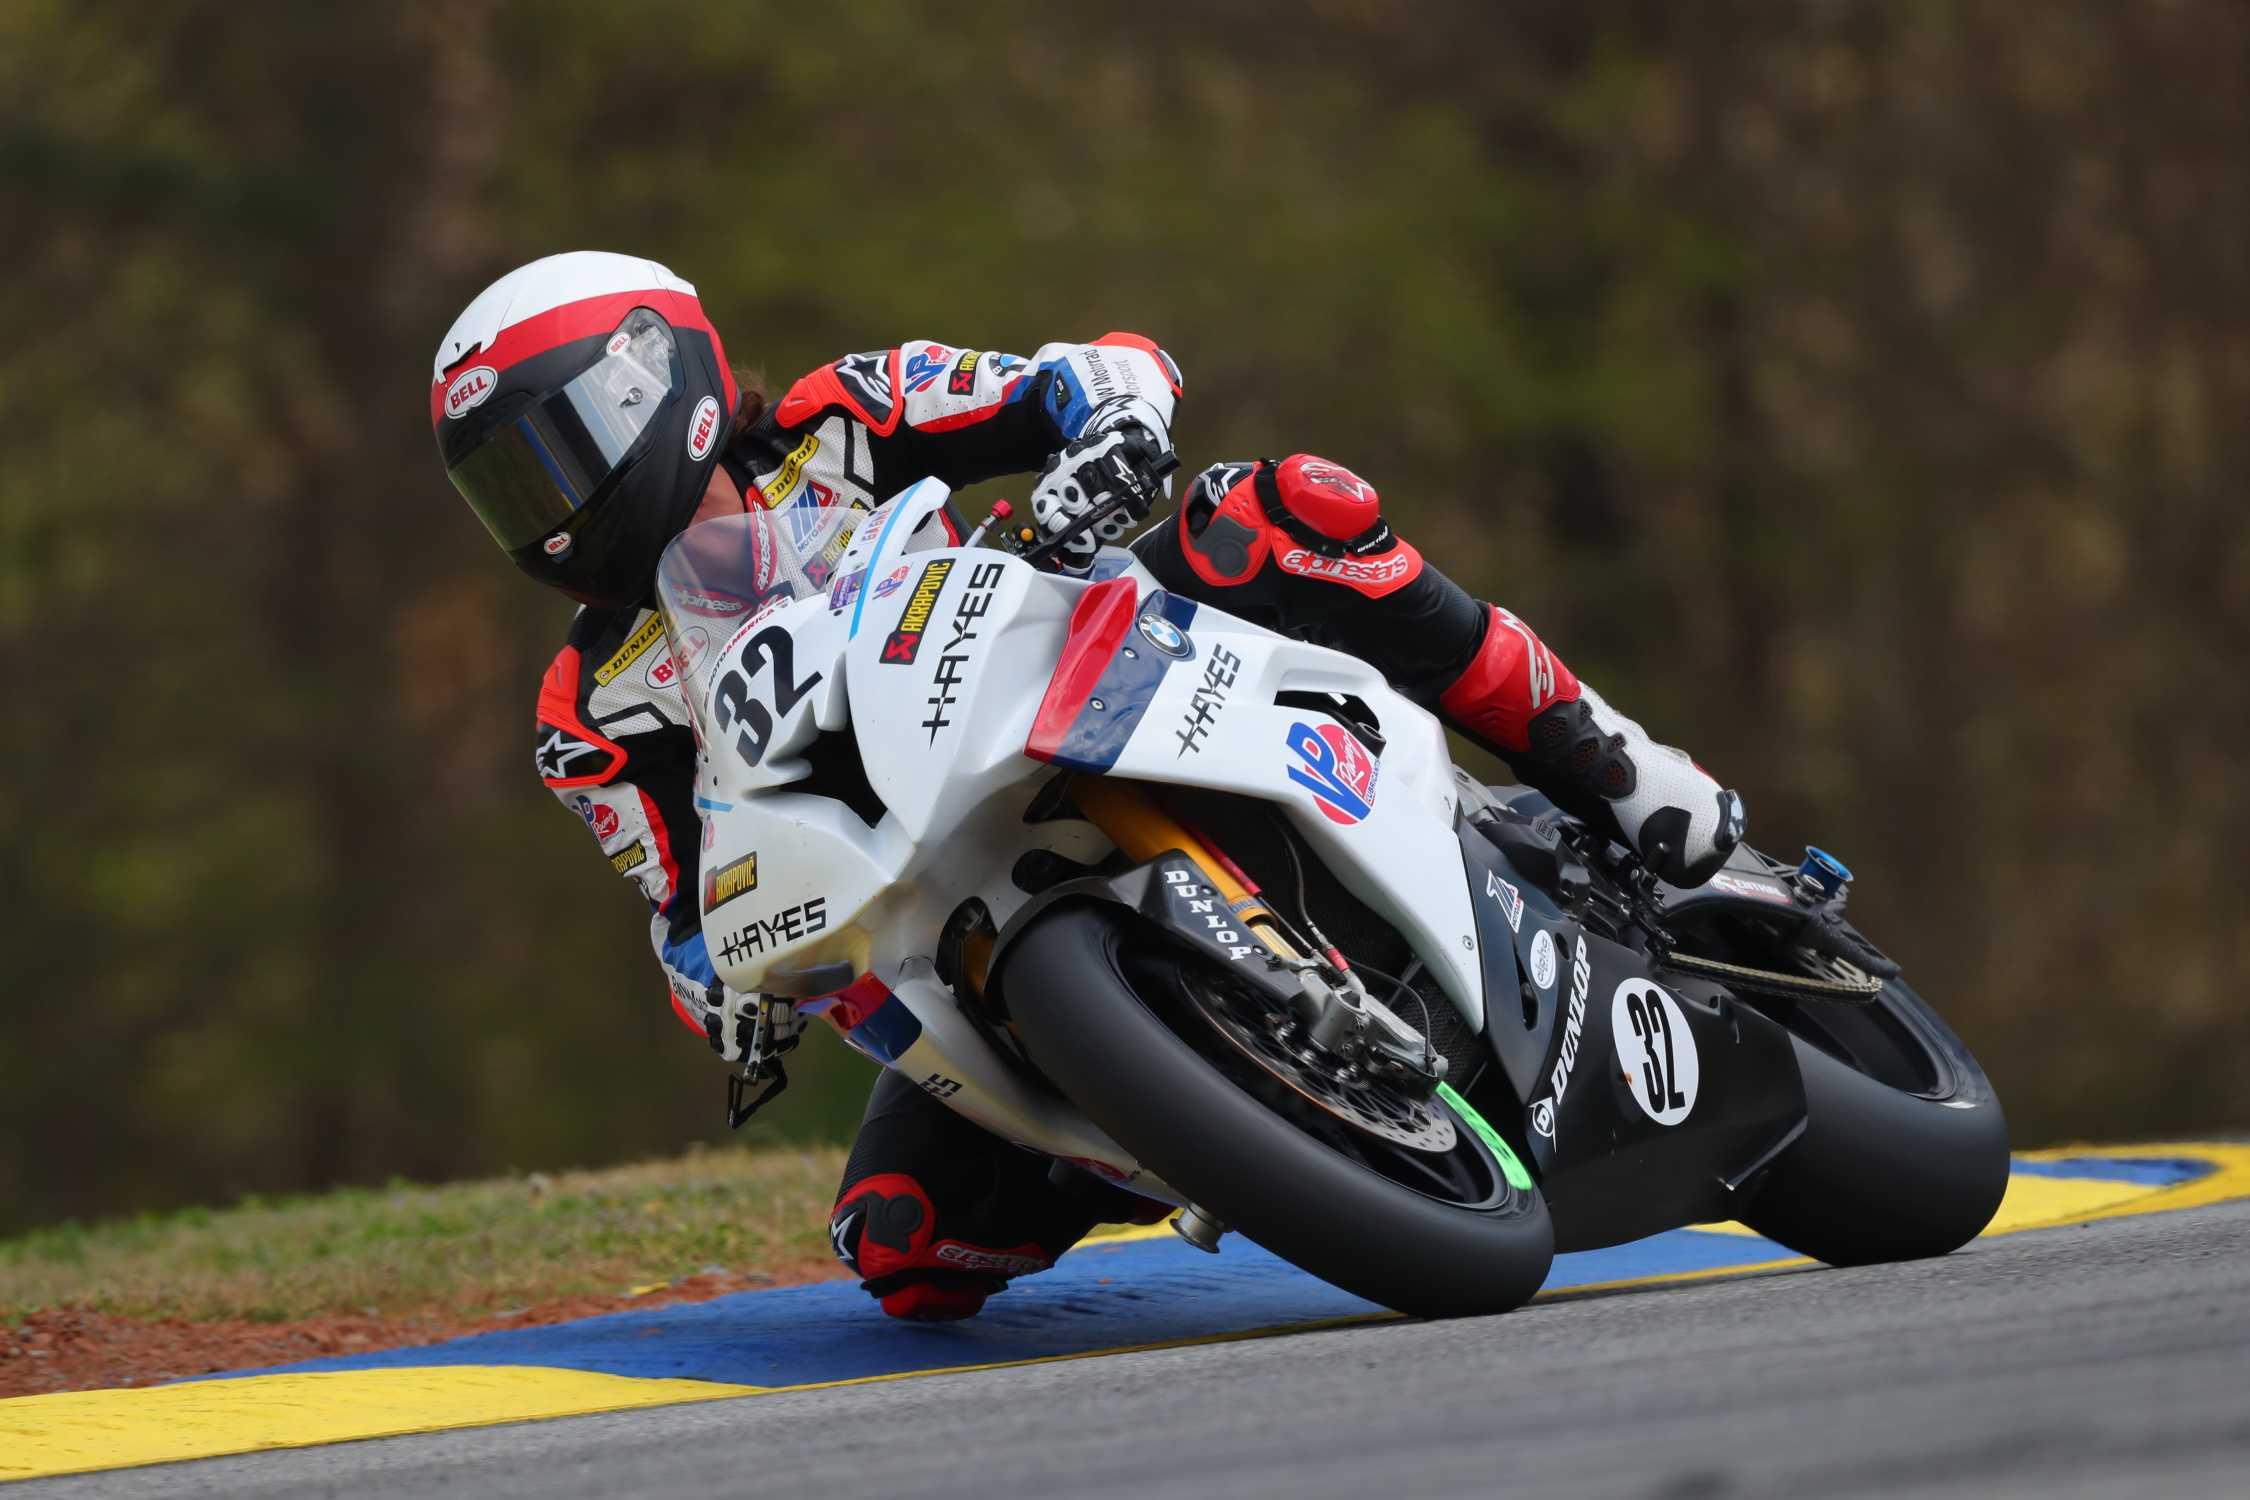 bmw scheibe racing rider jack cagne 32